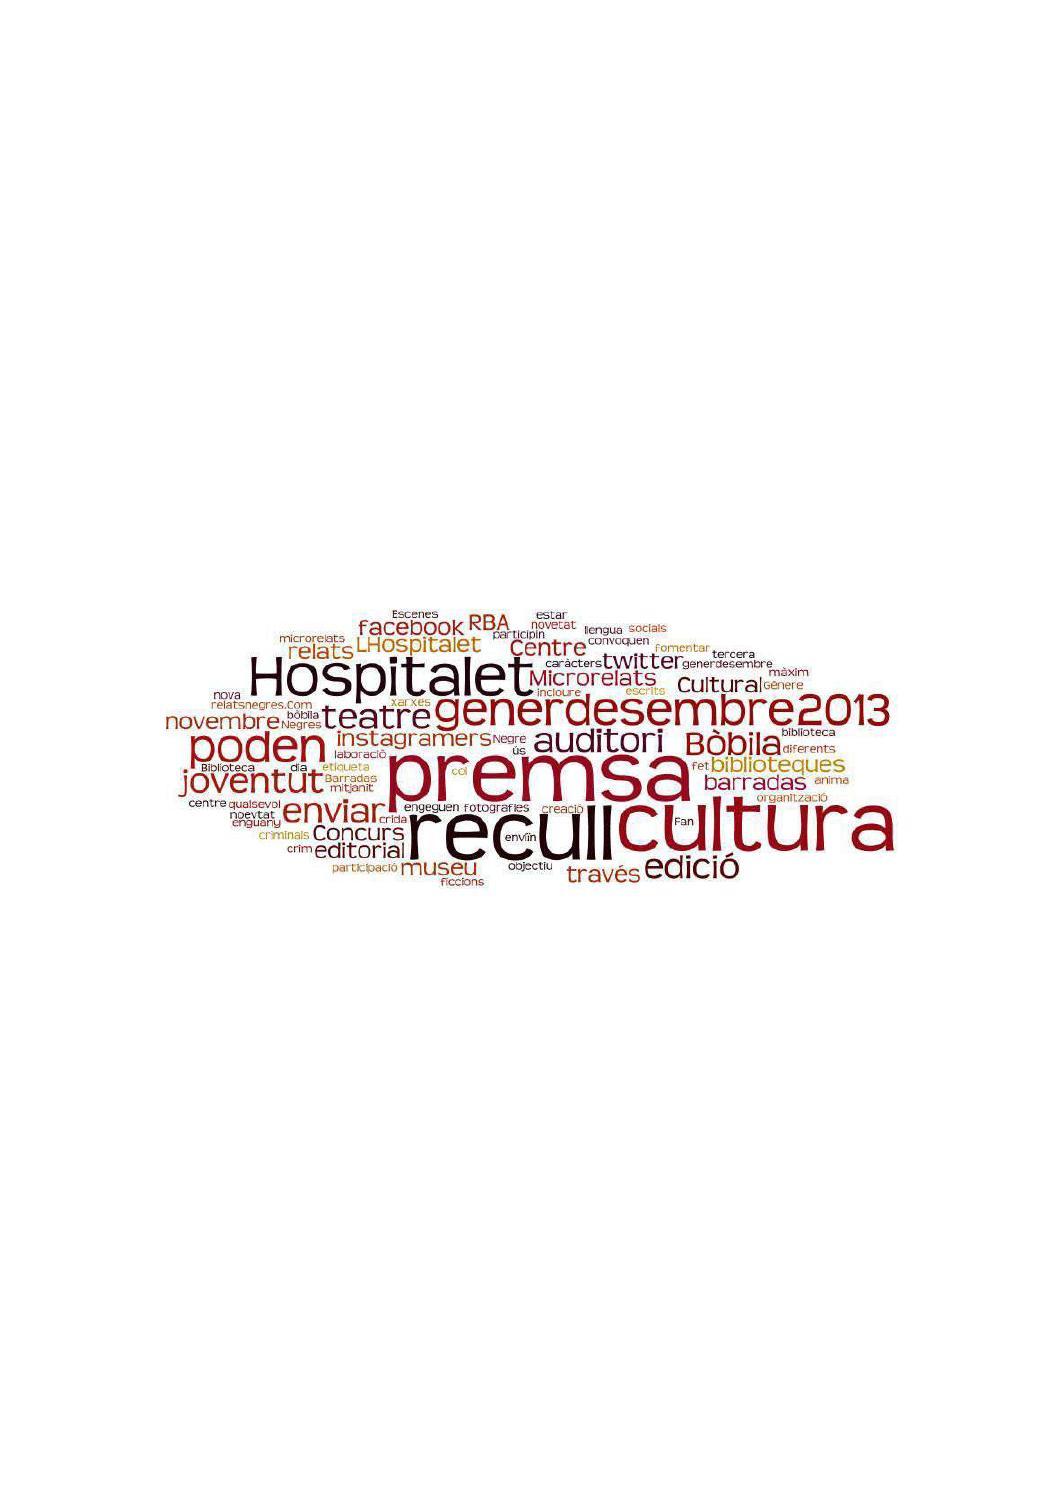 Recull de premsa 2013 by Pilar Gonzalo - issuu